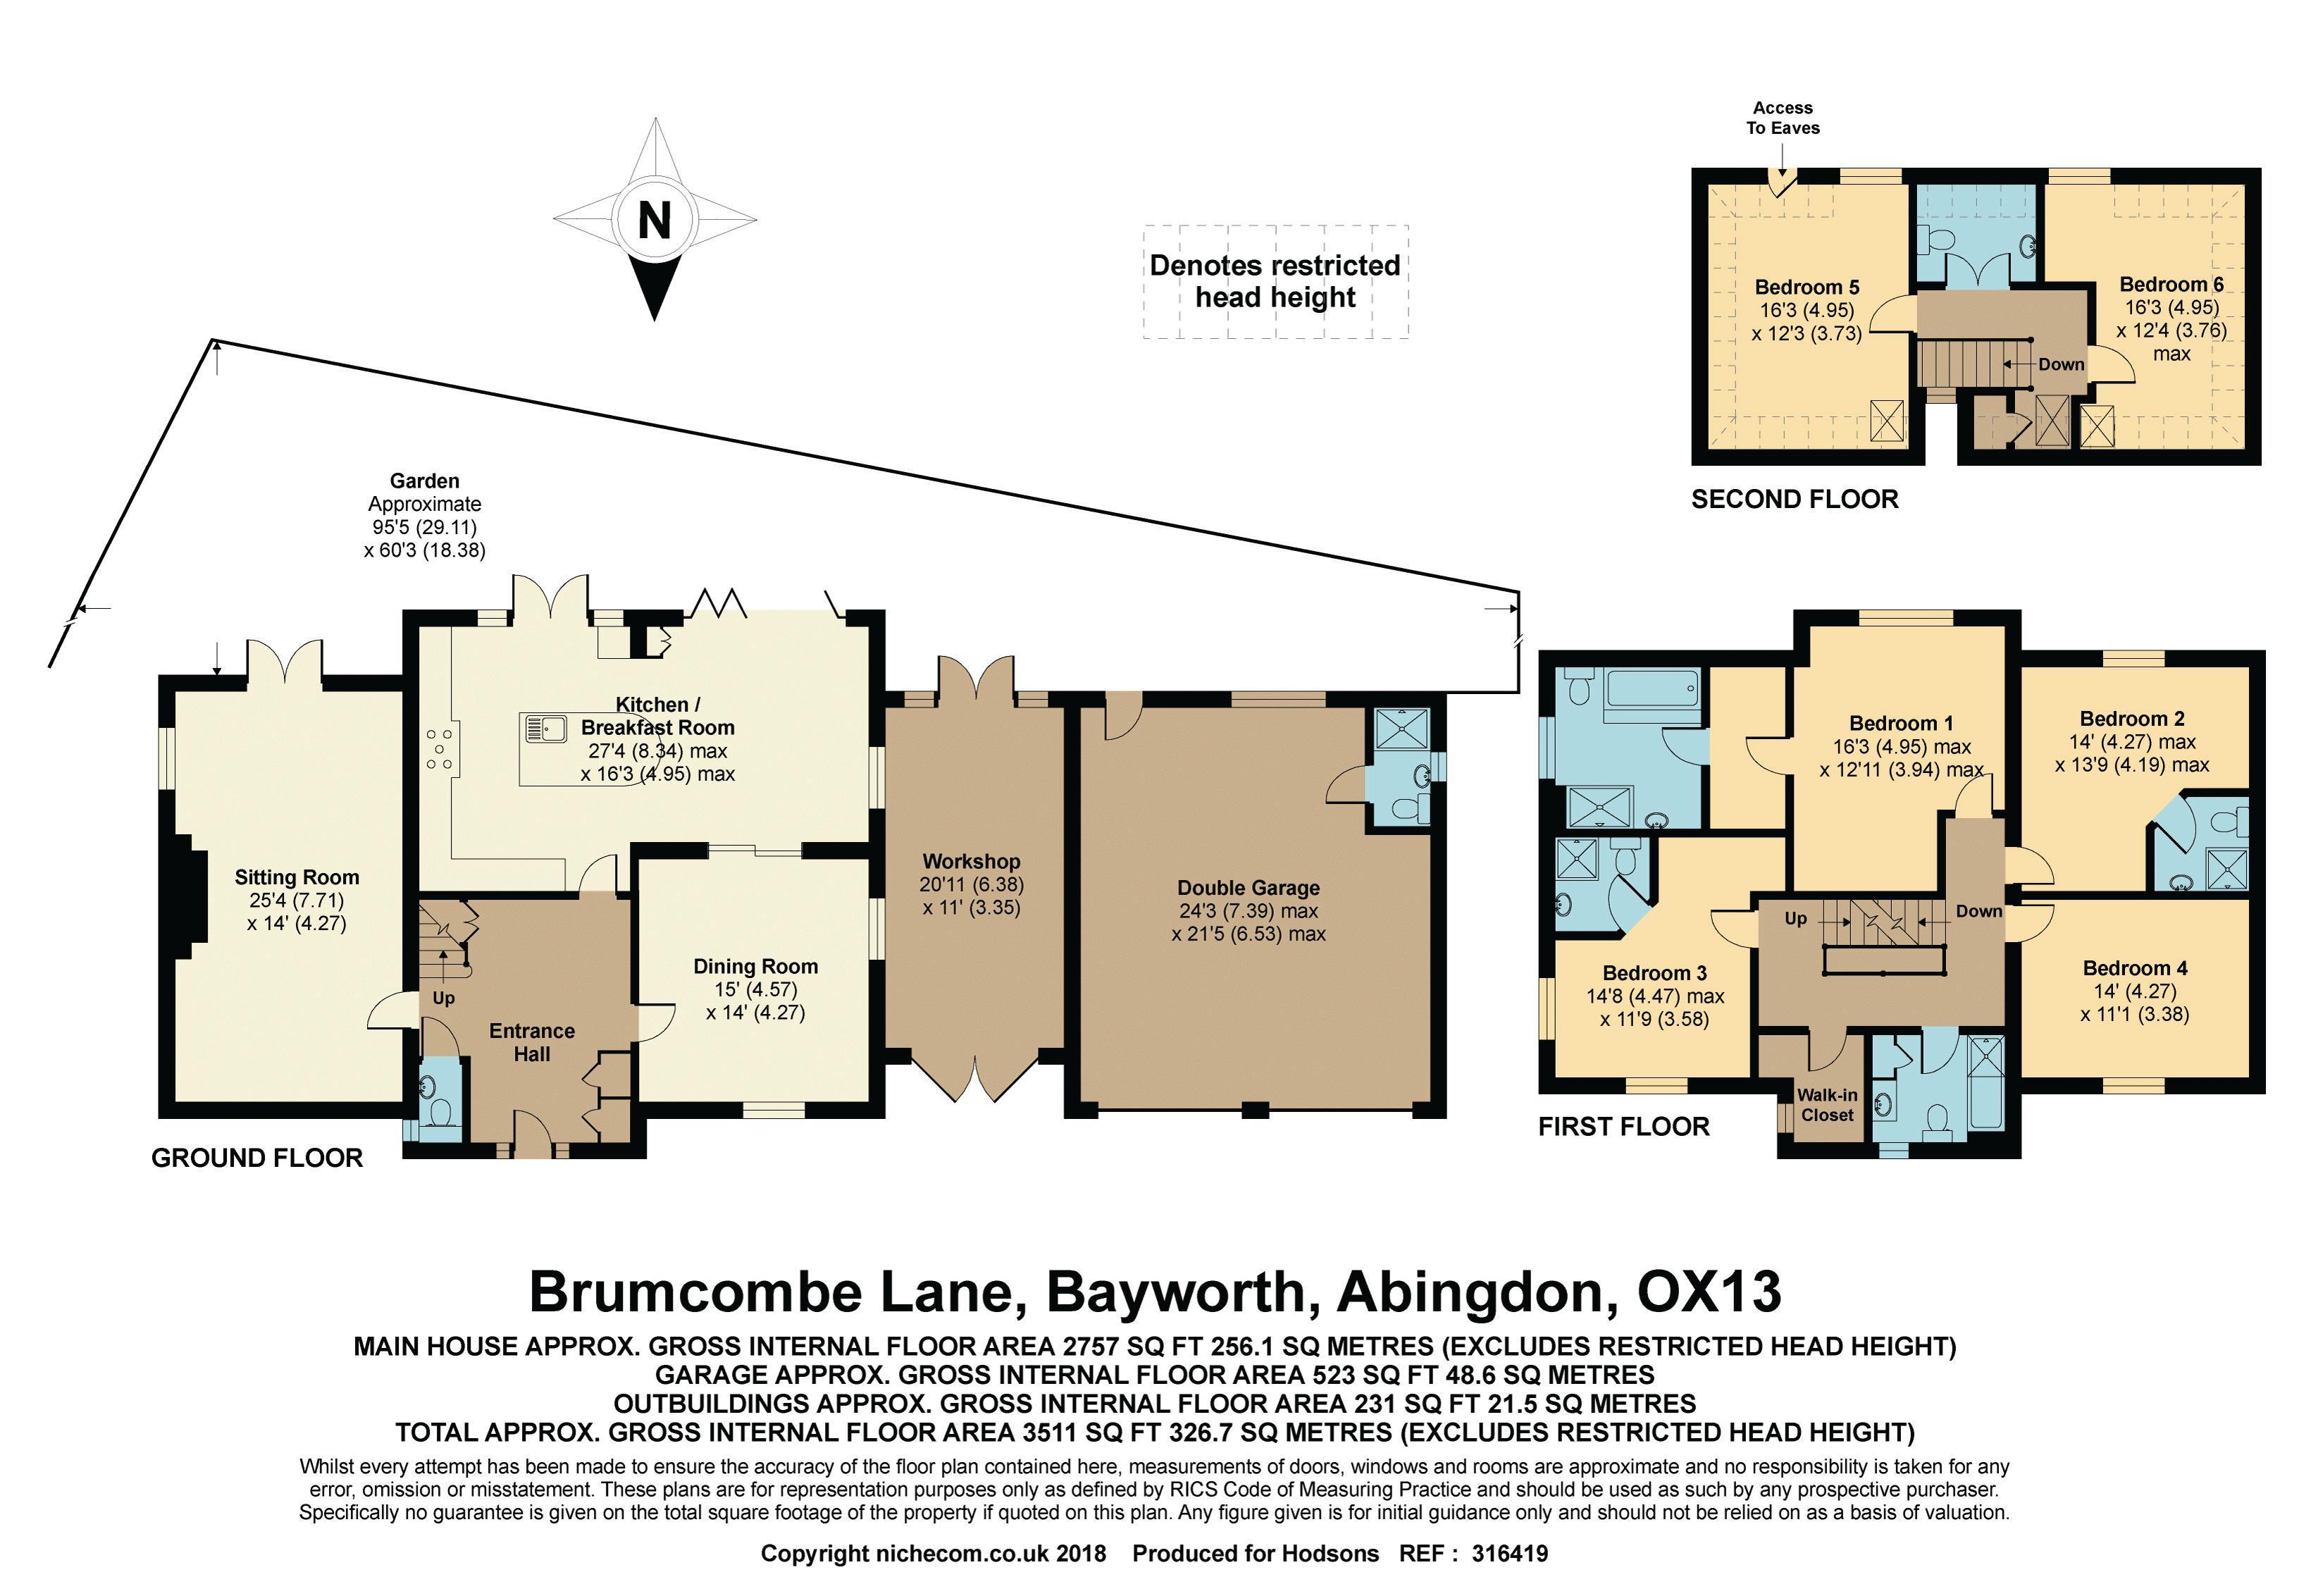 Brumcombe Lane Bayworth